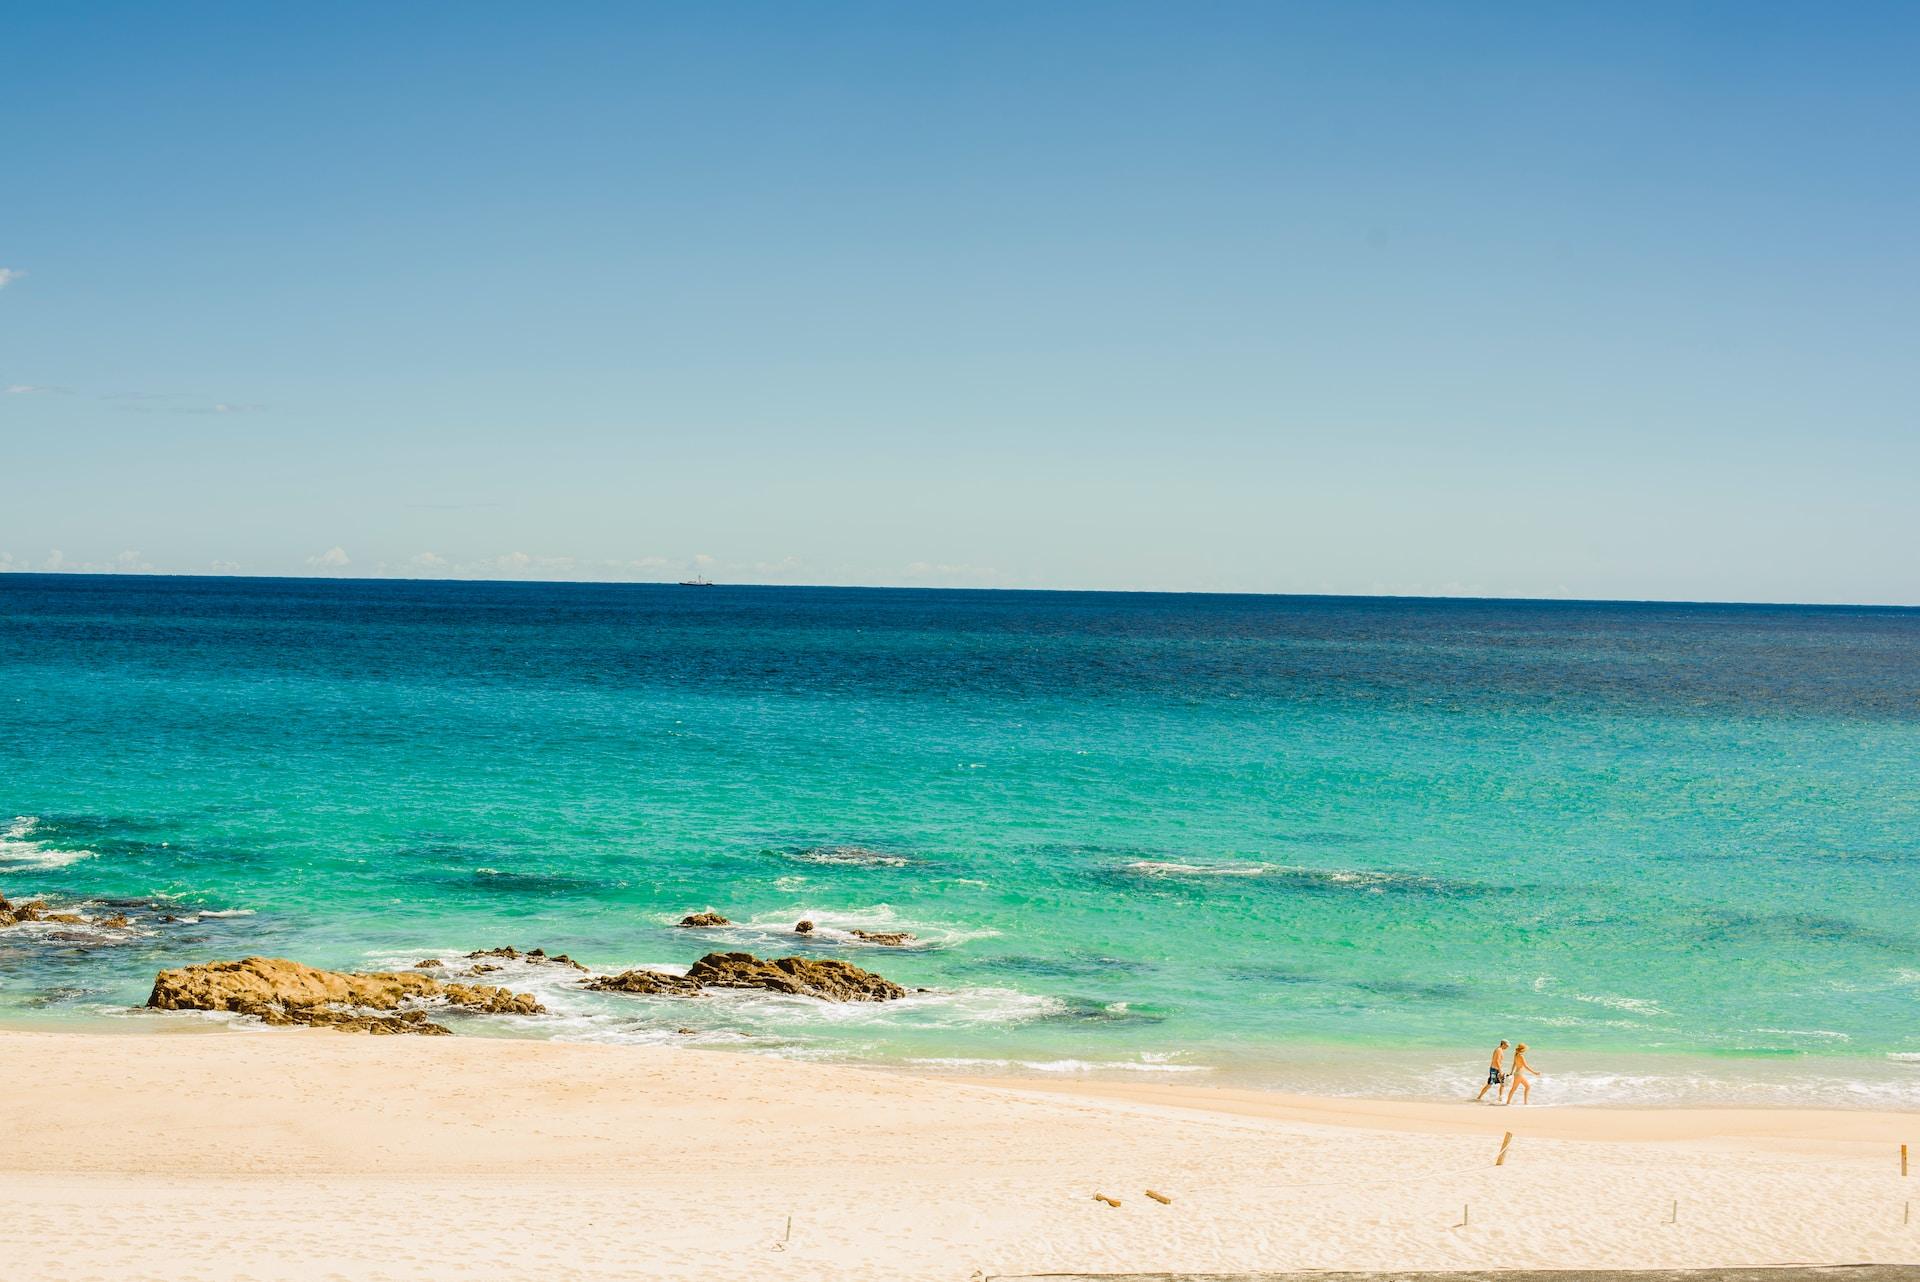 La Ribera & East Cape South image